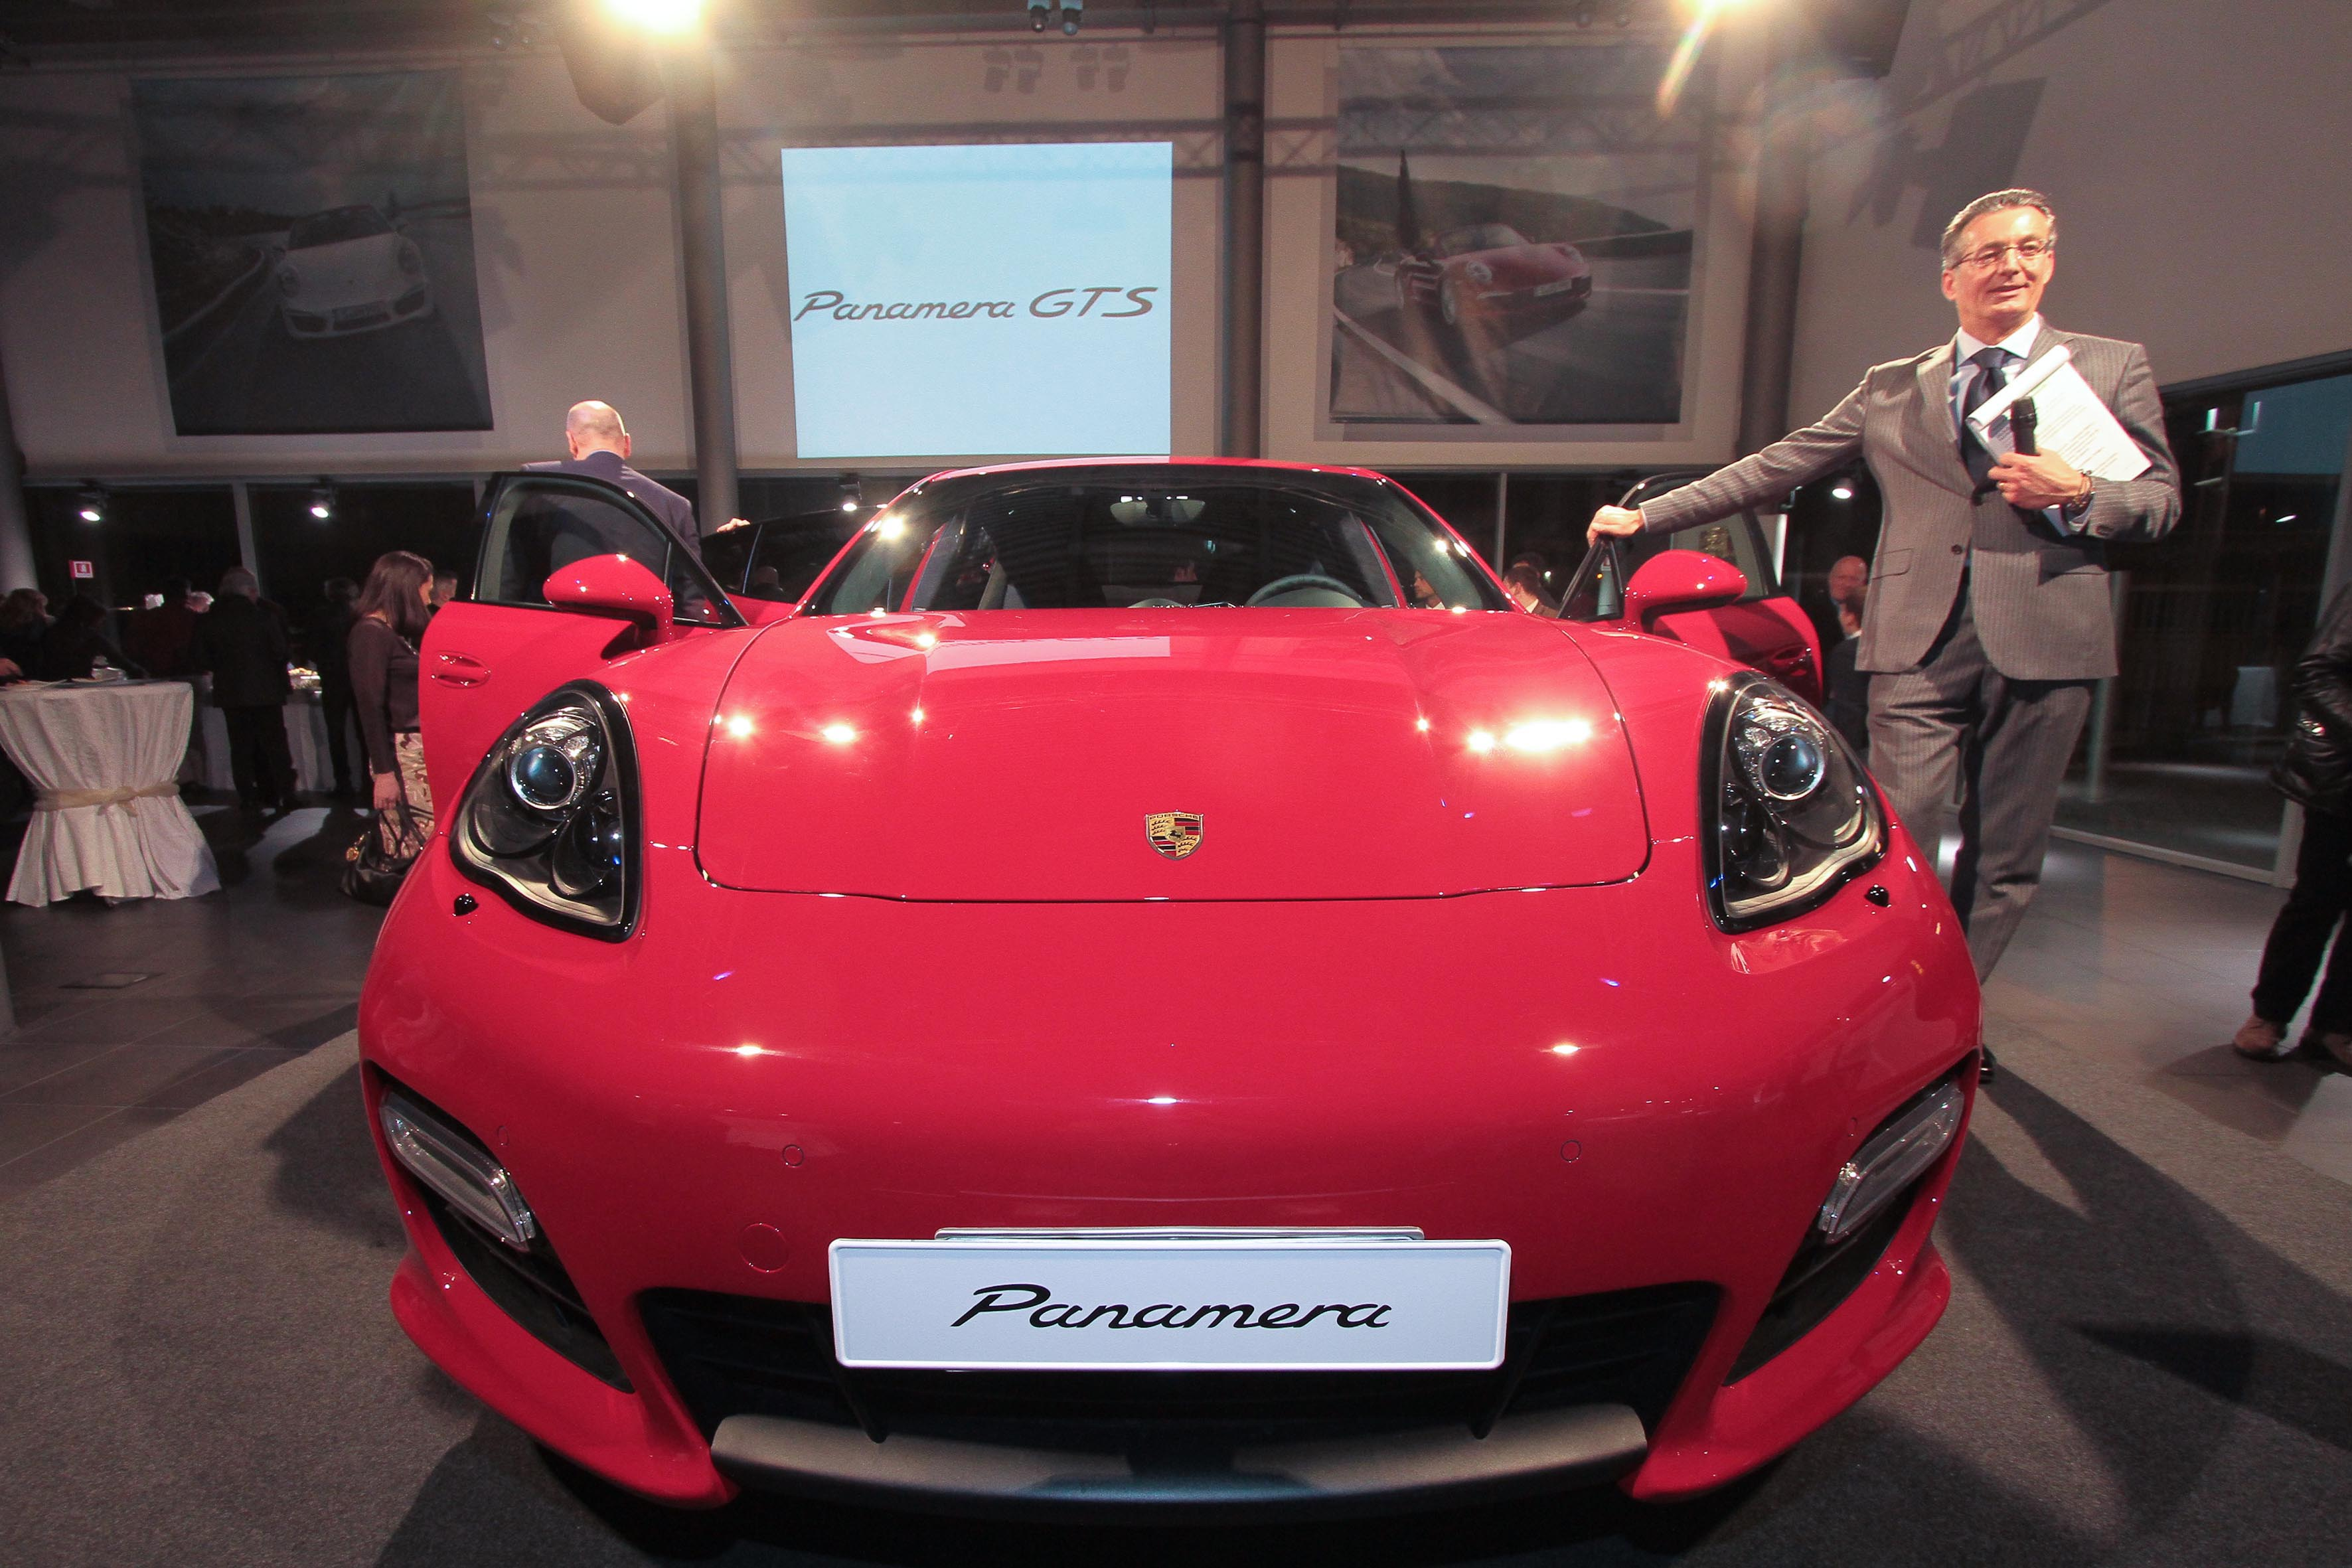 PRESSPHOTO Firenze, Centro Porsche Firenze, presentazione nuova Porsche Panamera GTS.